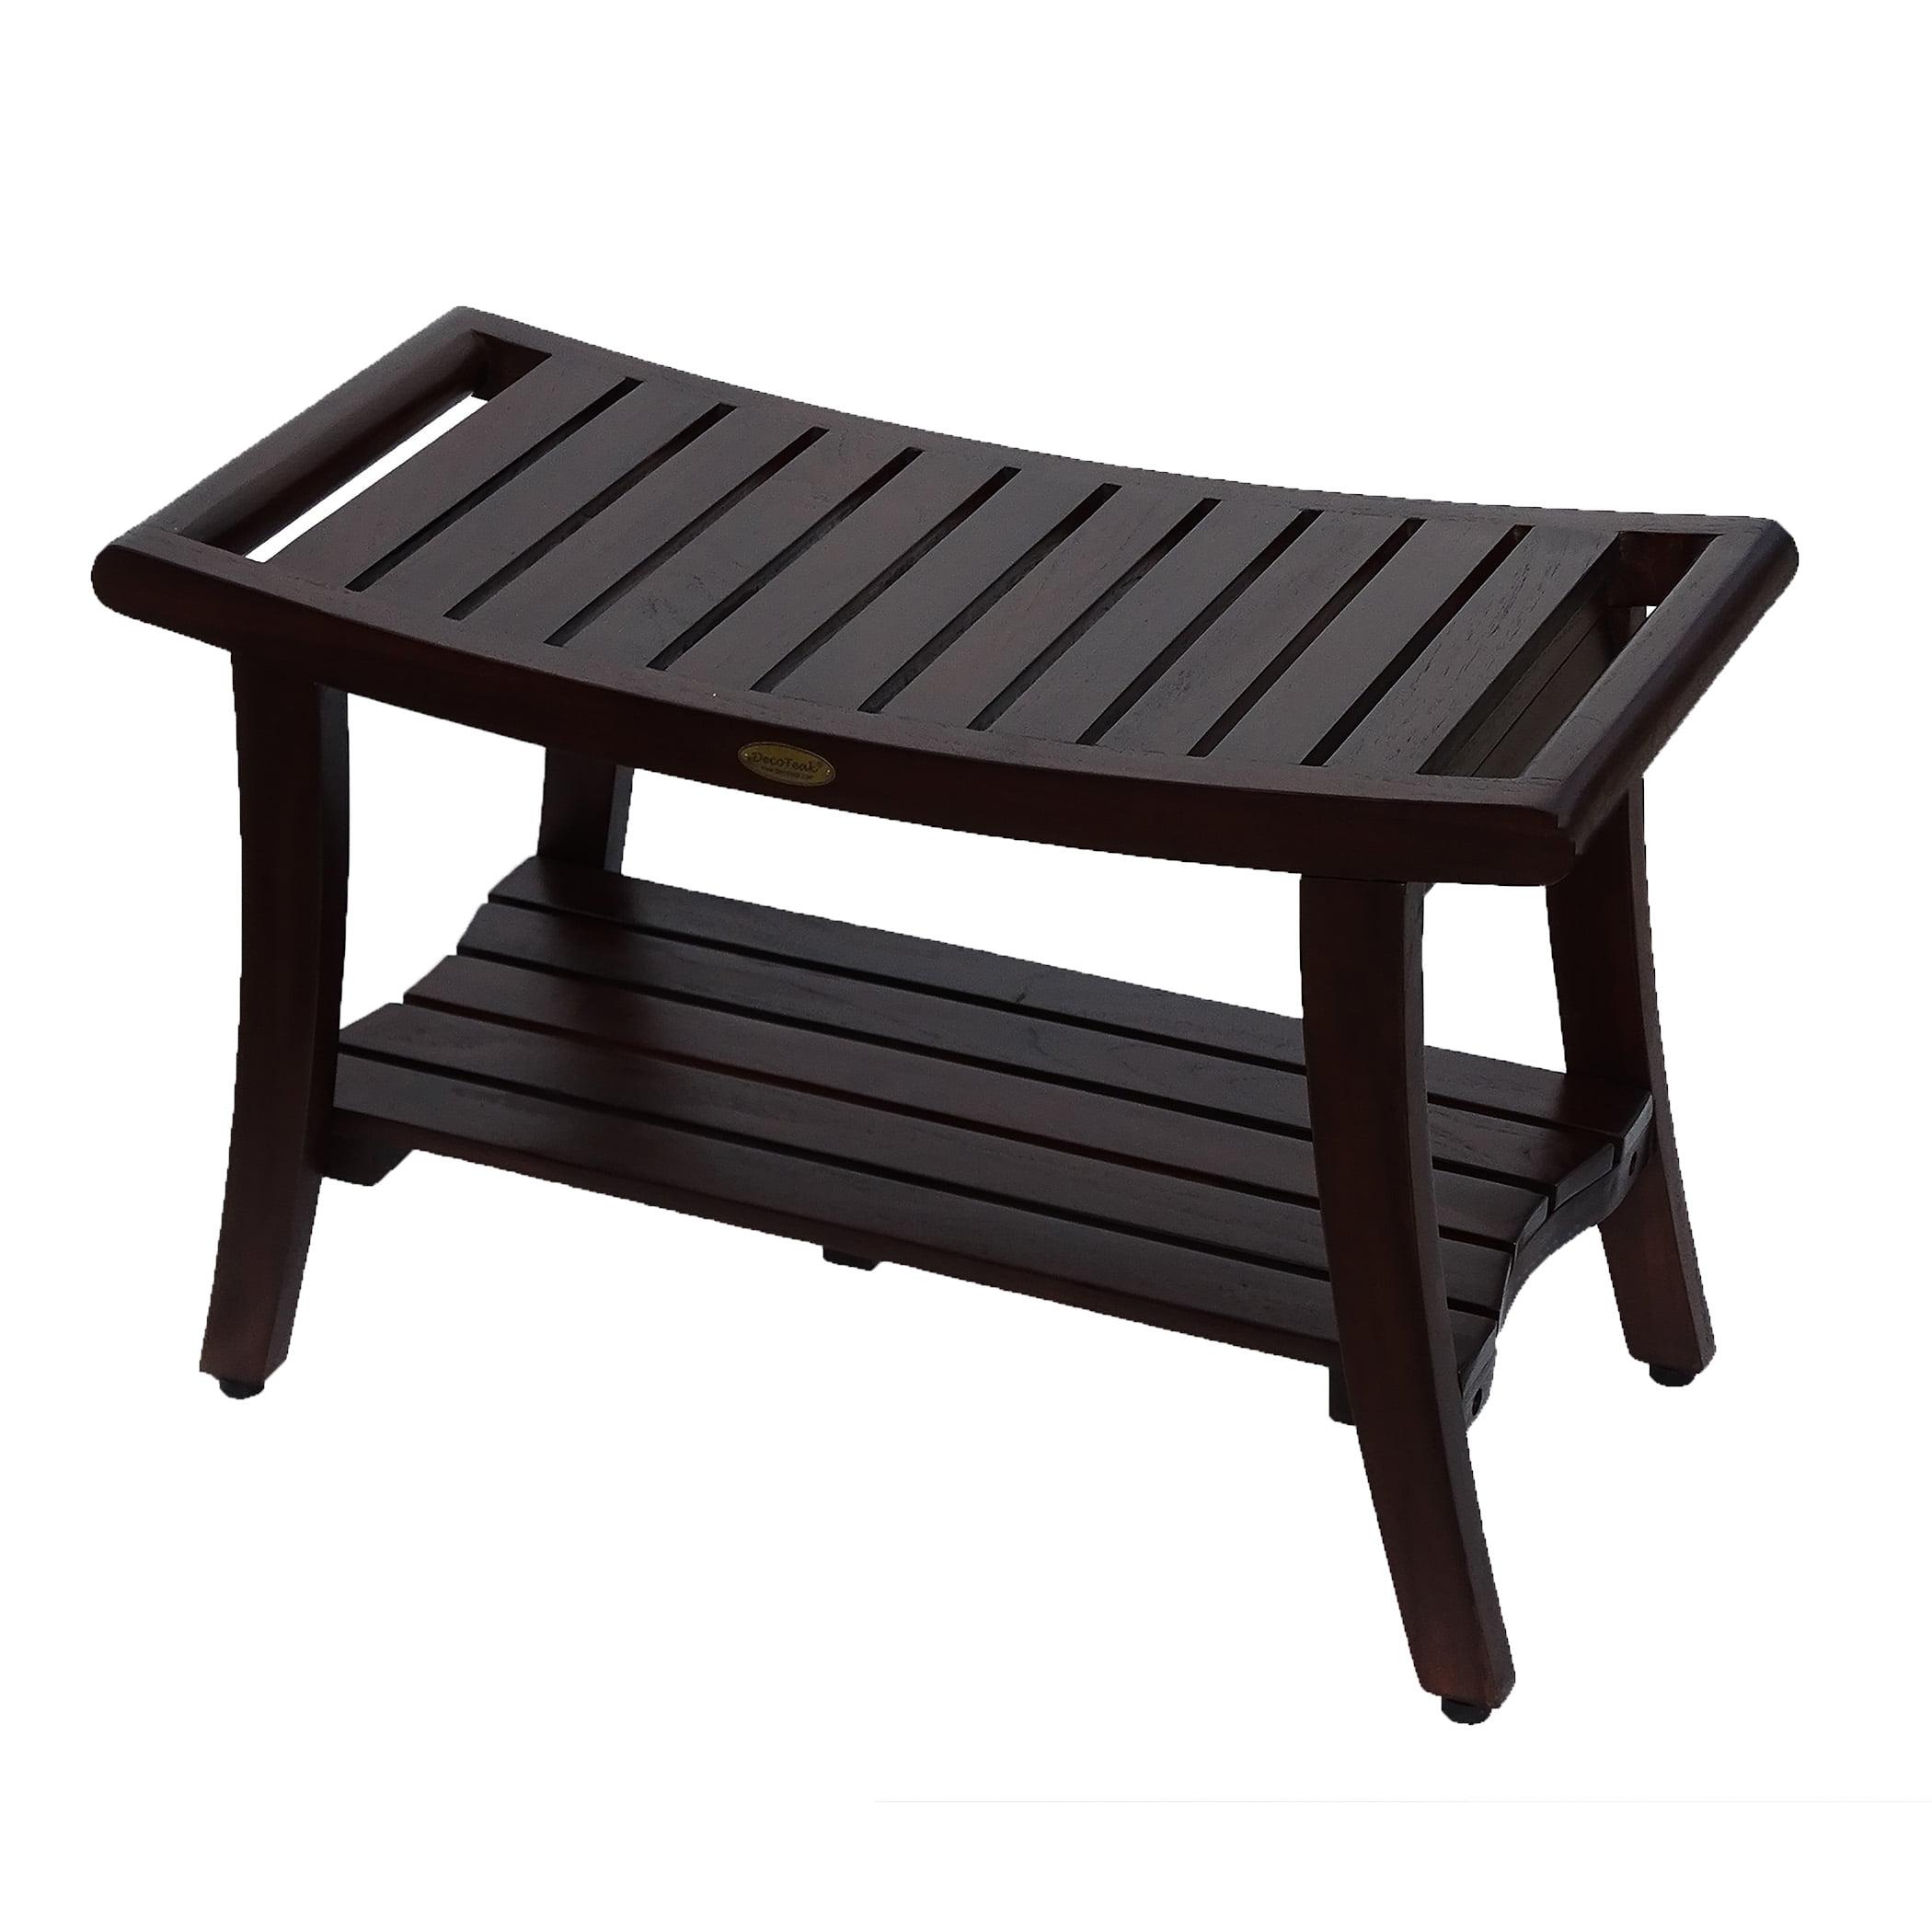 Incredible Decoteak Harmony 30 Teak Shower Bench With Shelf And Liftaide Arms Walmart Com Machost Co Dining Chair Design Ideas Machostcouk